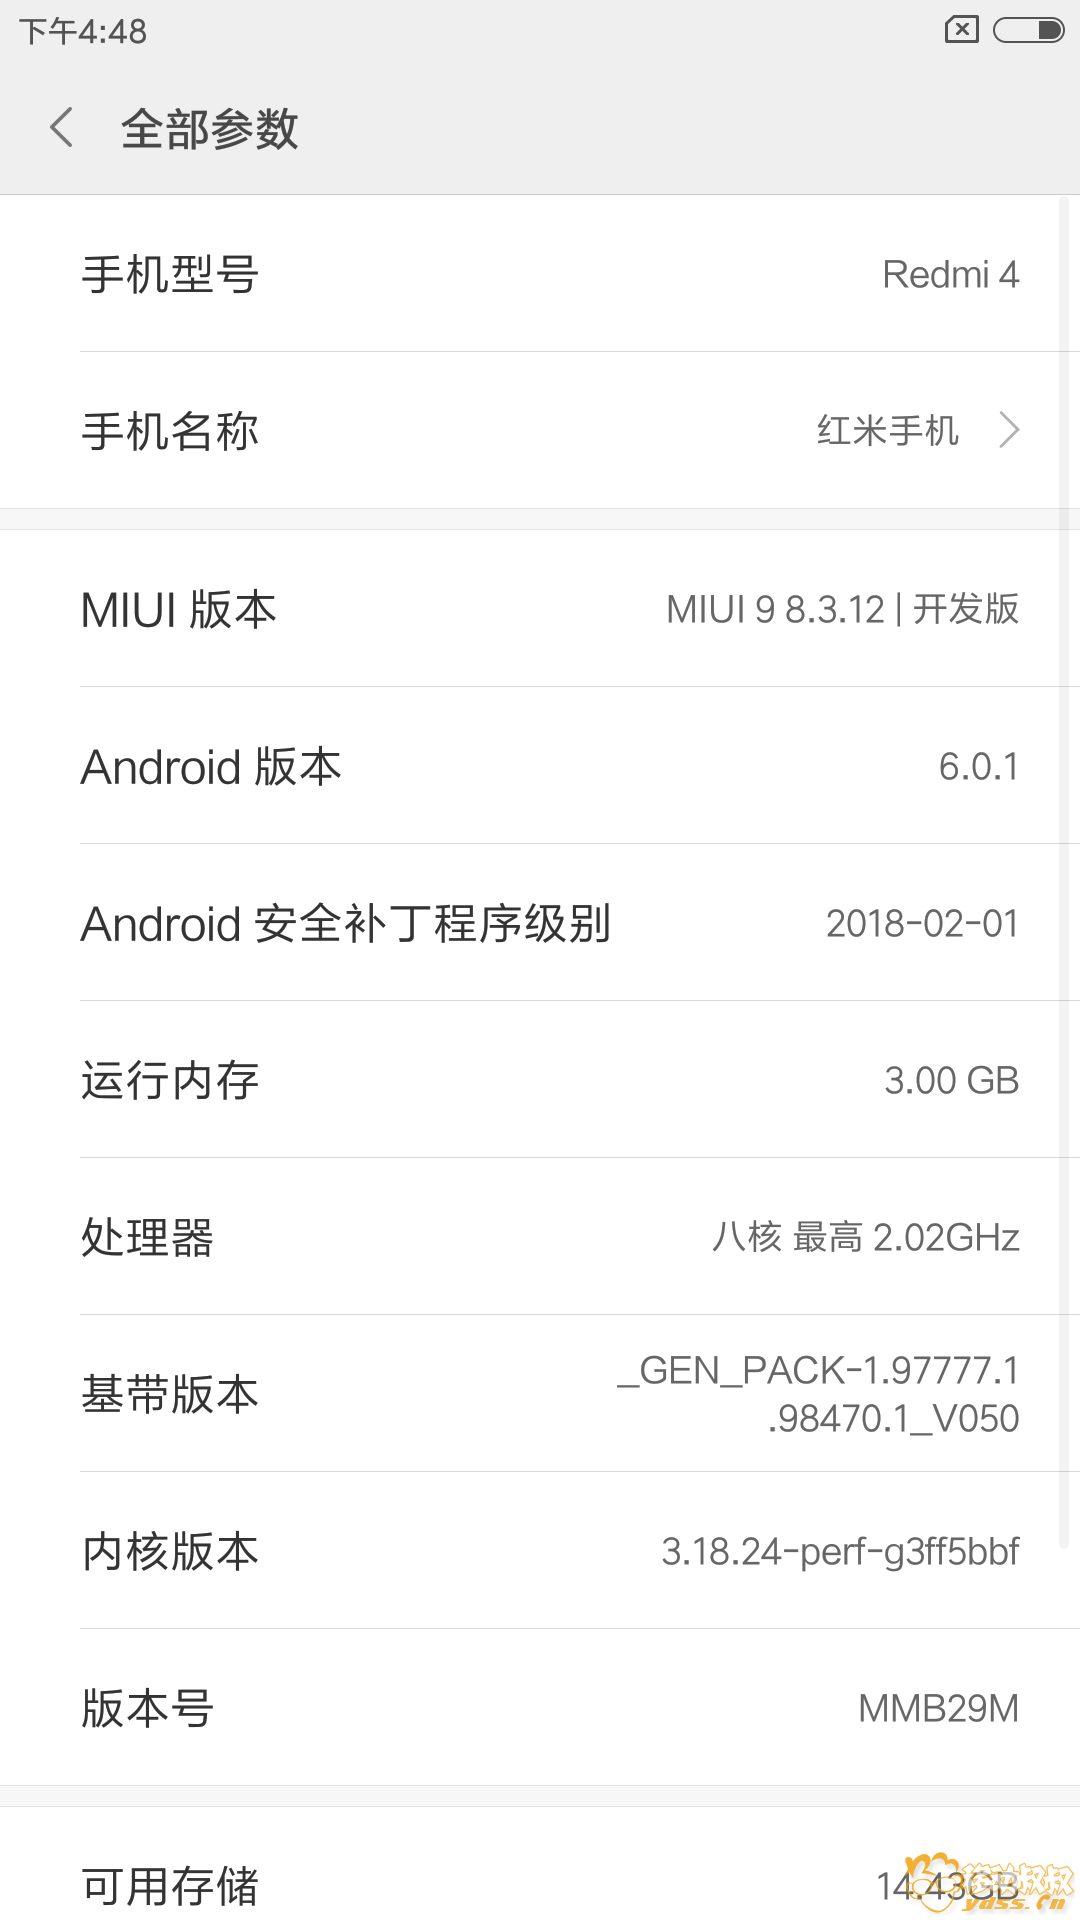 Screenshot_2018-03-12-16-48-37-470_com.android.settings.png